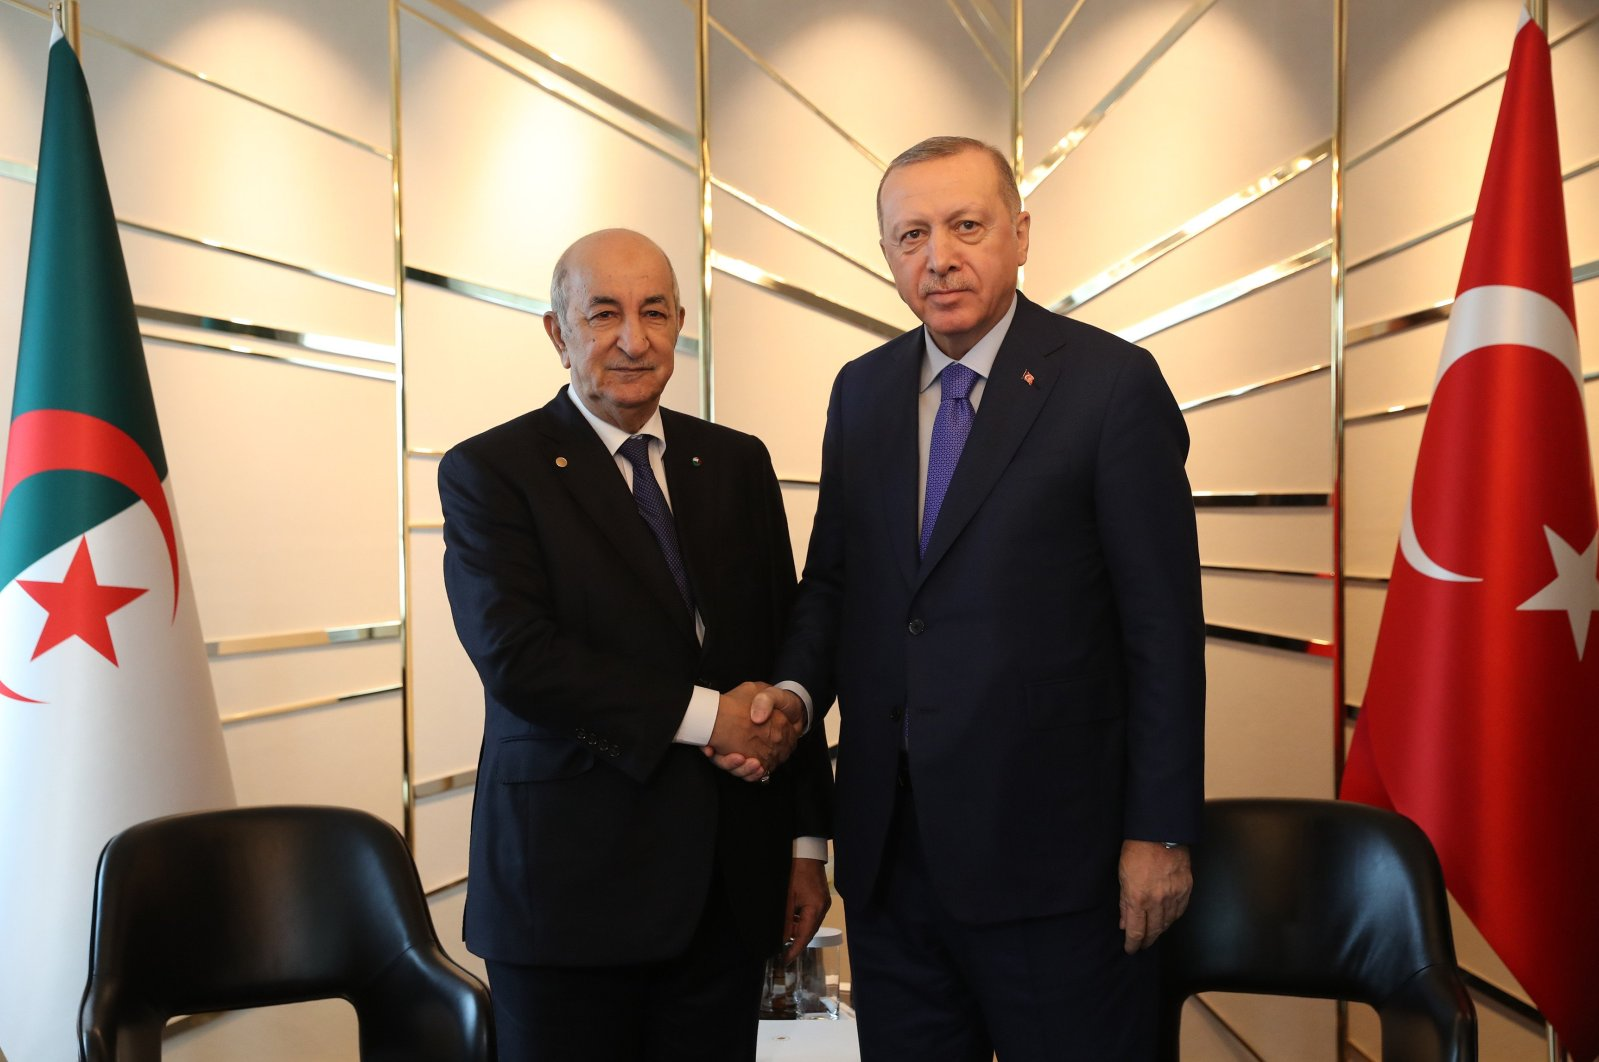 President Recep Tayyip Erdoğan shakes hands with Algerian President Abdelmadjid Tebboune ahead of a conference over Libya in Berlin, Jan.21, 2020. (IHA)